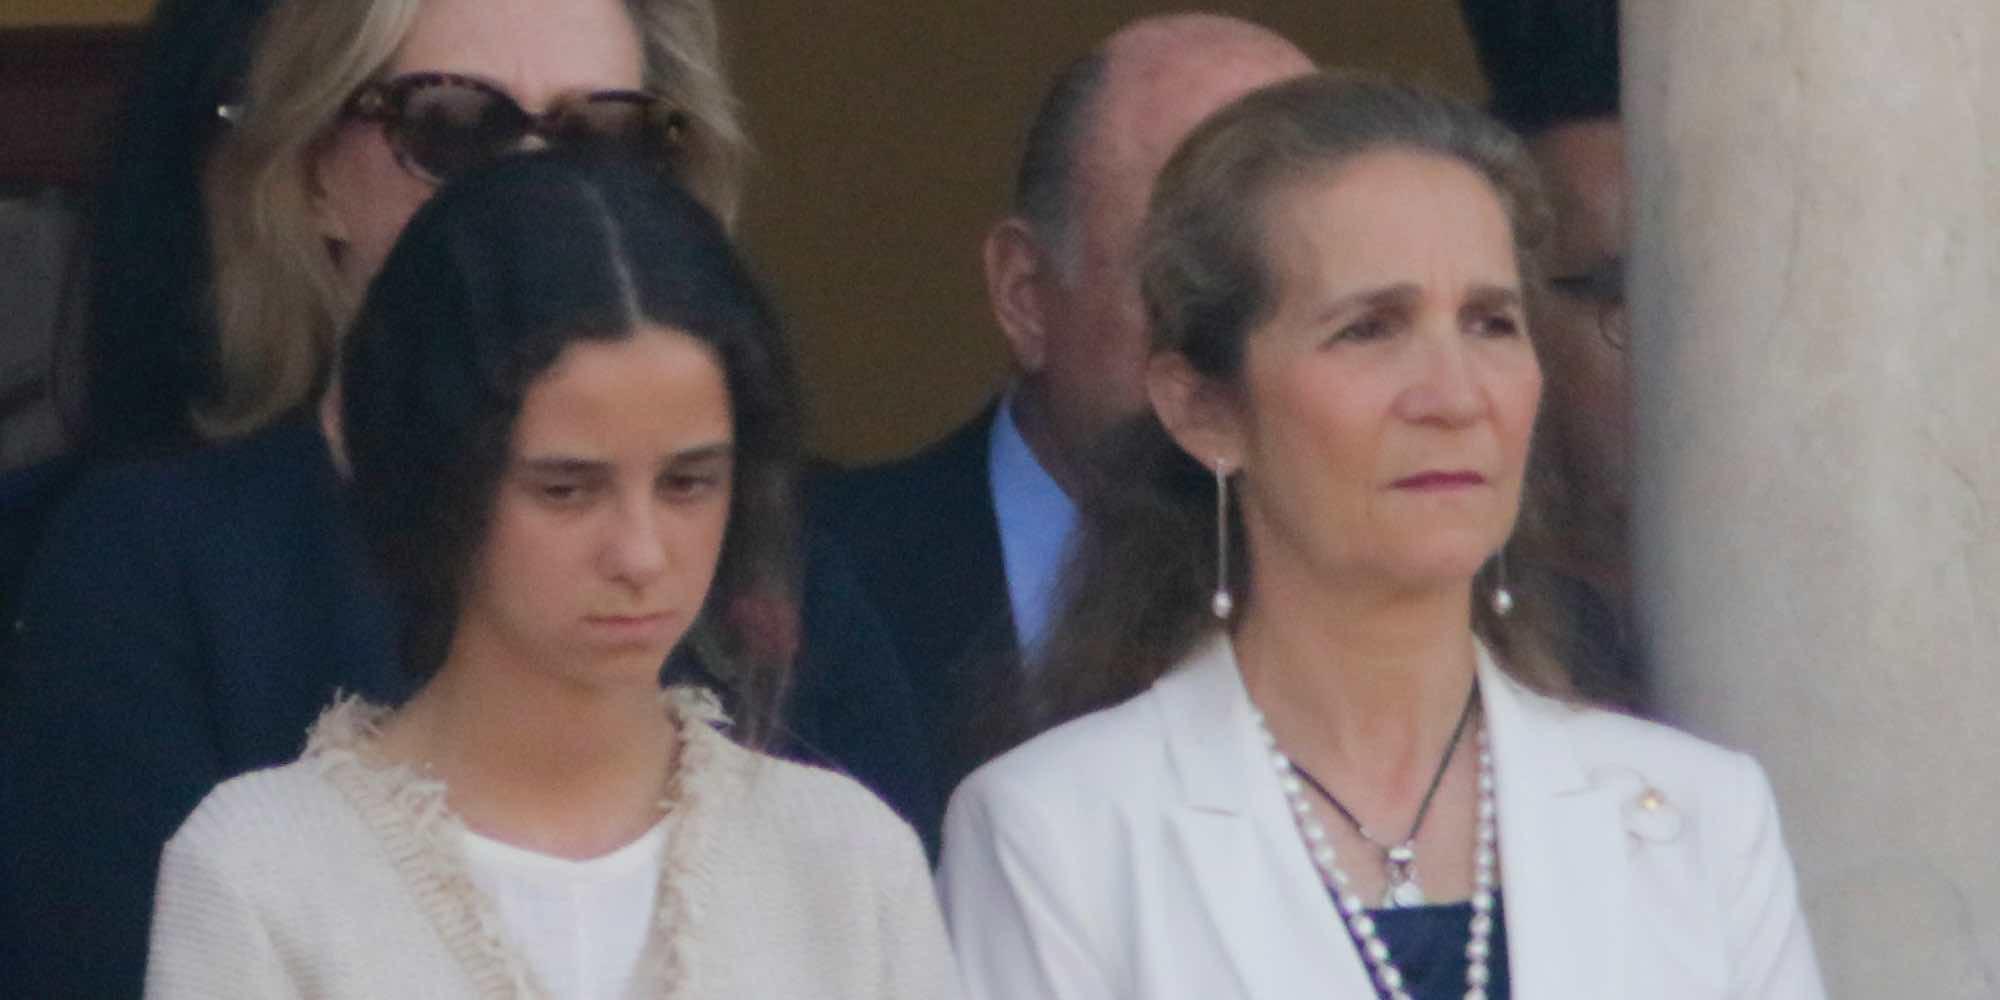 La Infanta Elena cambia Palma por una visita express a la Infanta Cristina antes de irse a los toros a Sevilla